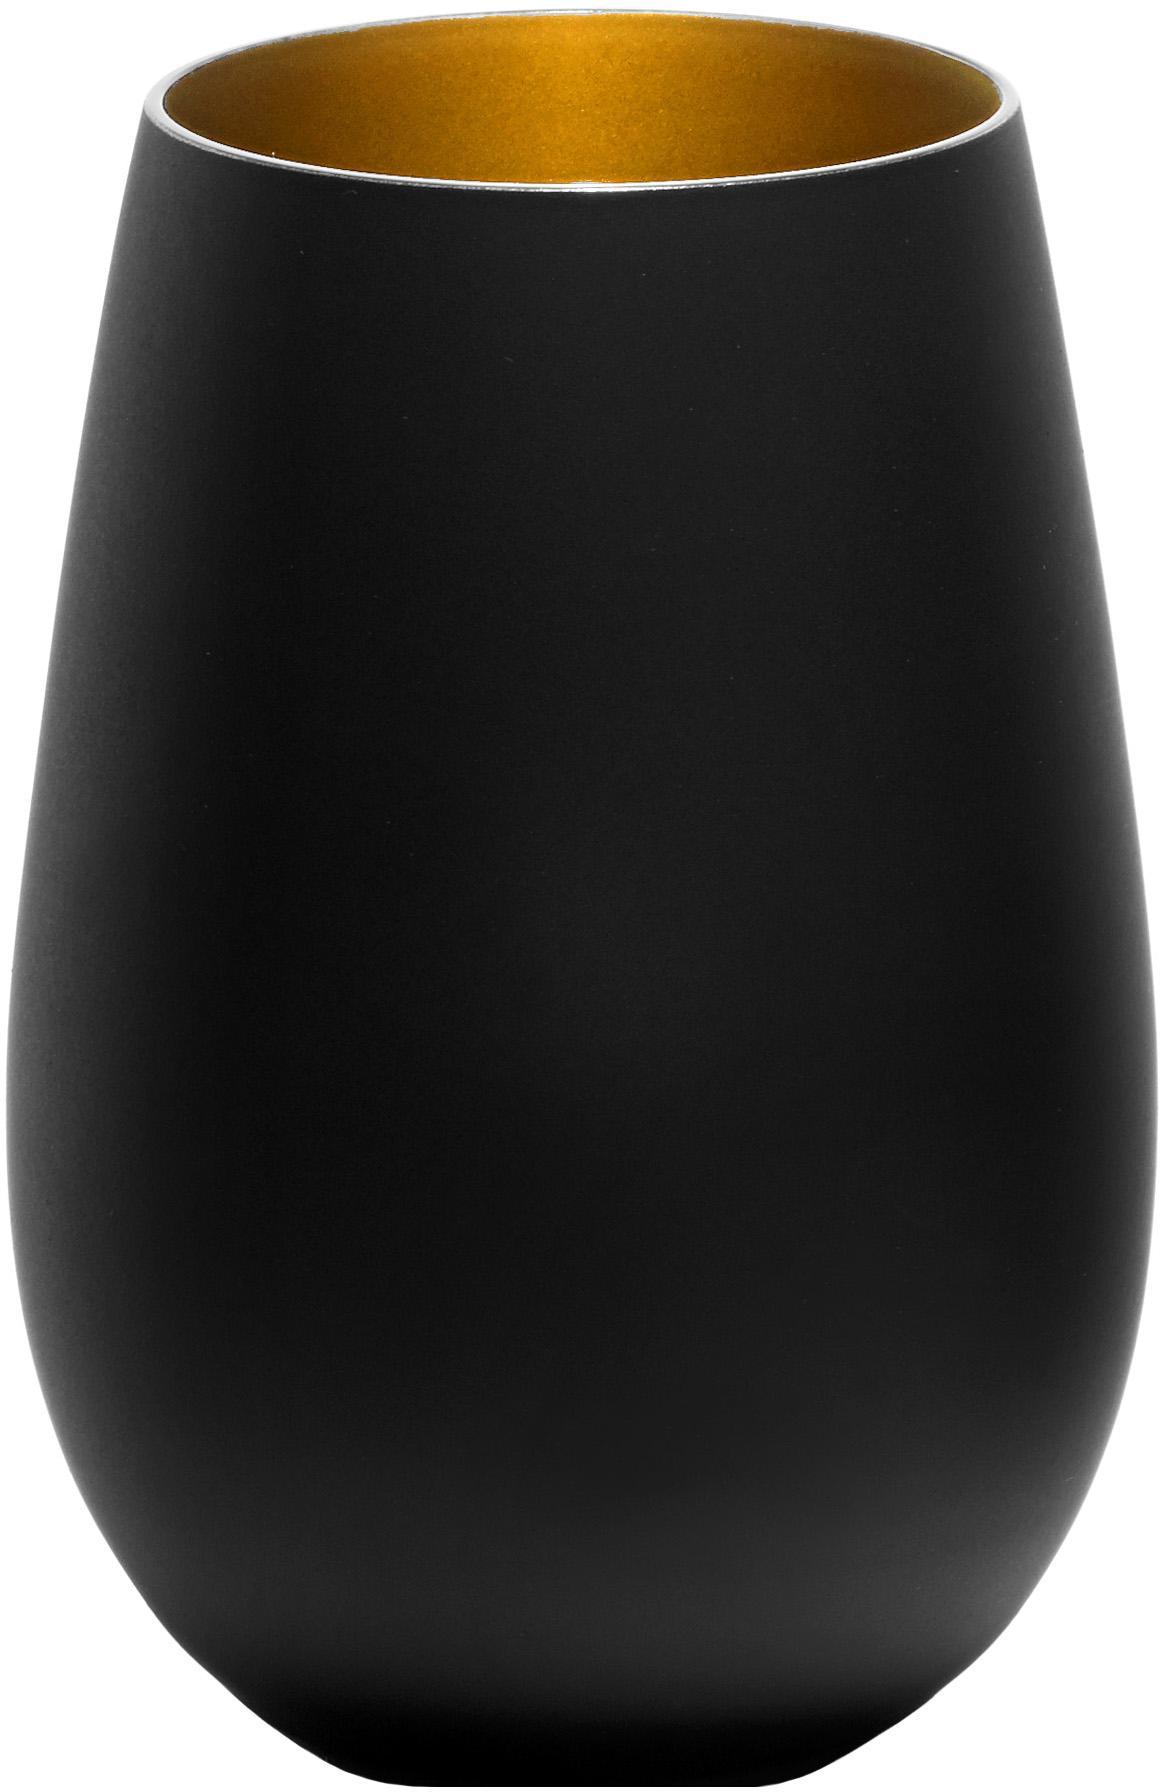 Vasos highball de cristal Elements, 6uds., Cristal recubierto, Negro, latón, Ø 9 x Al 12 cm